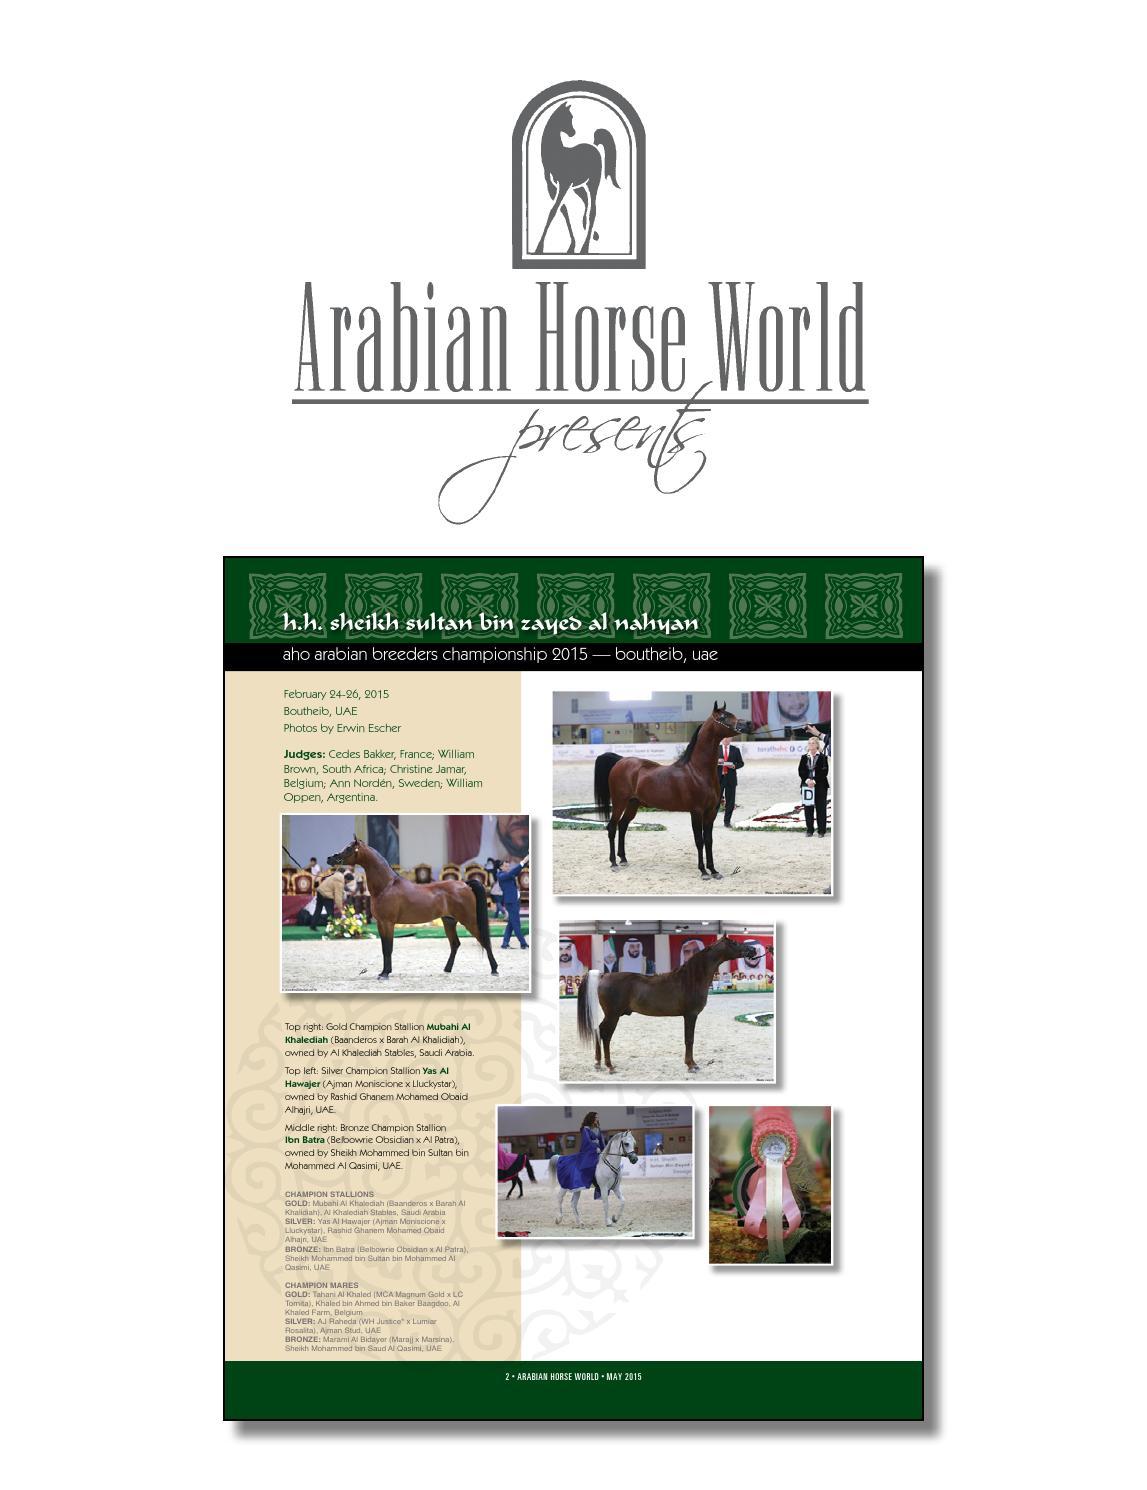 2015 Aho Arabian Breeders Championship By Arabian Horse